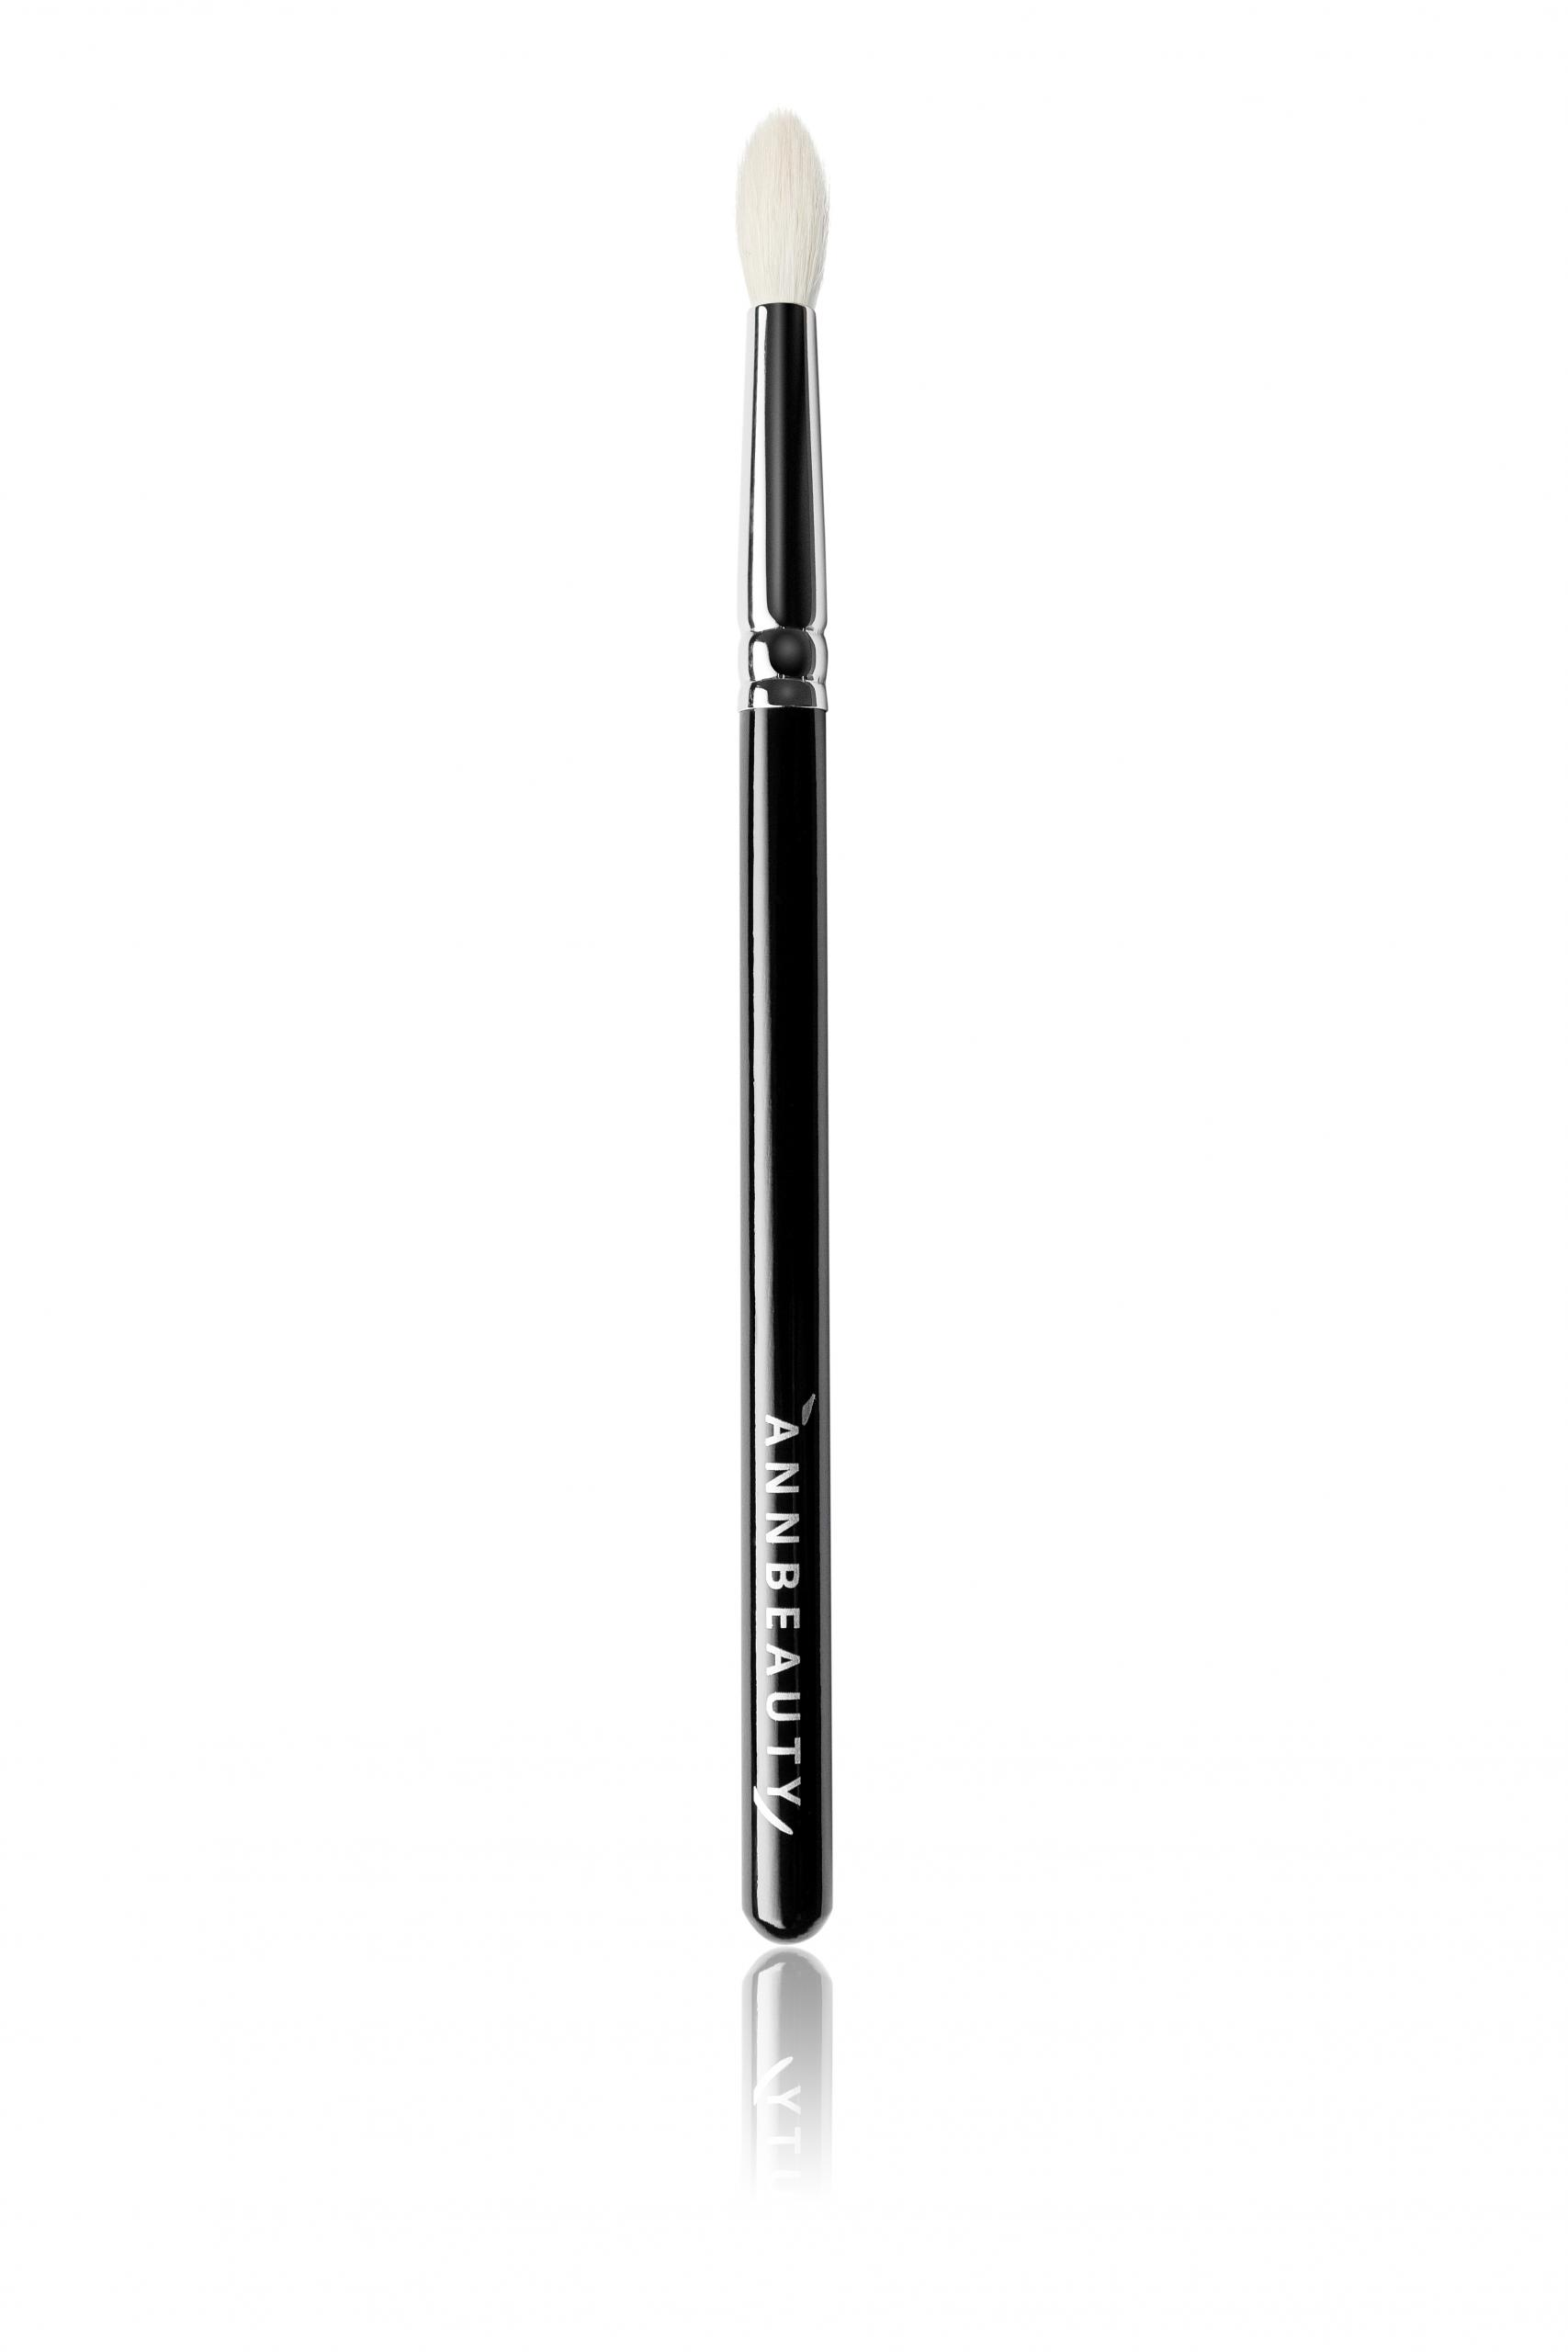 Кисть Annbeauty A9 для нанесения и растушевки теней и прорисовки складки фото ворса крупно